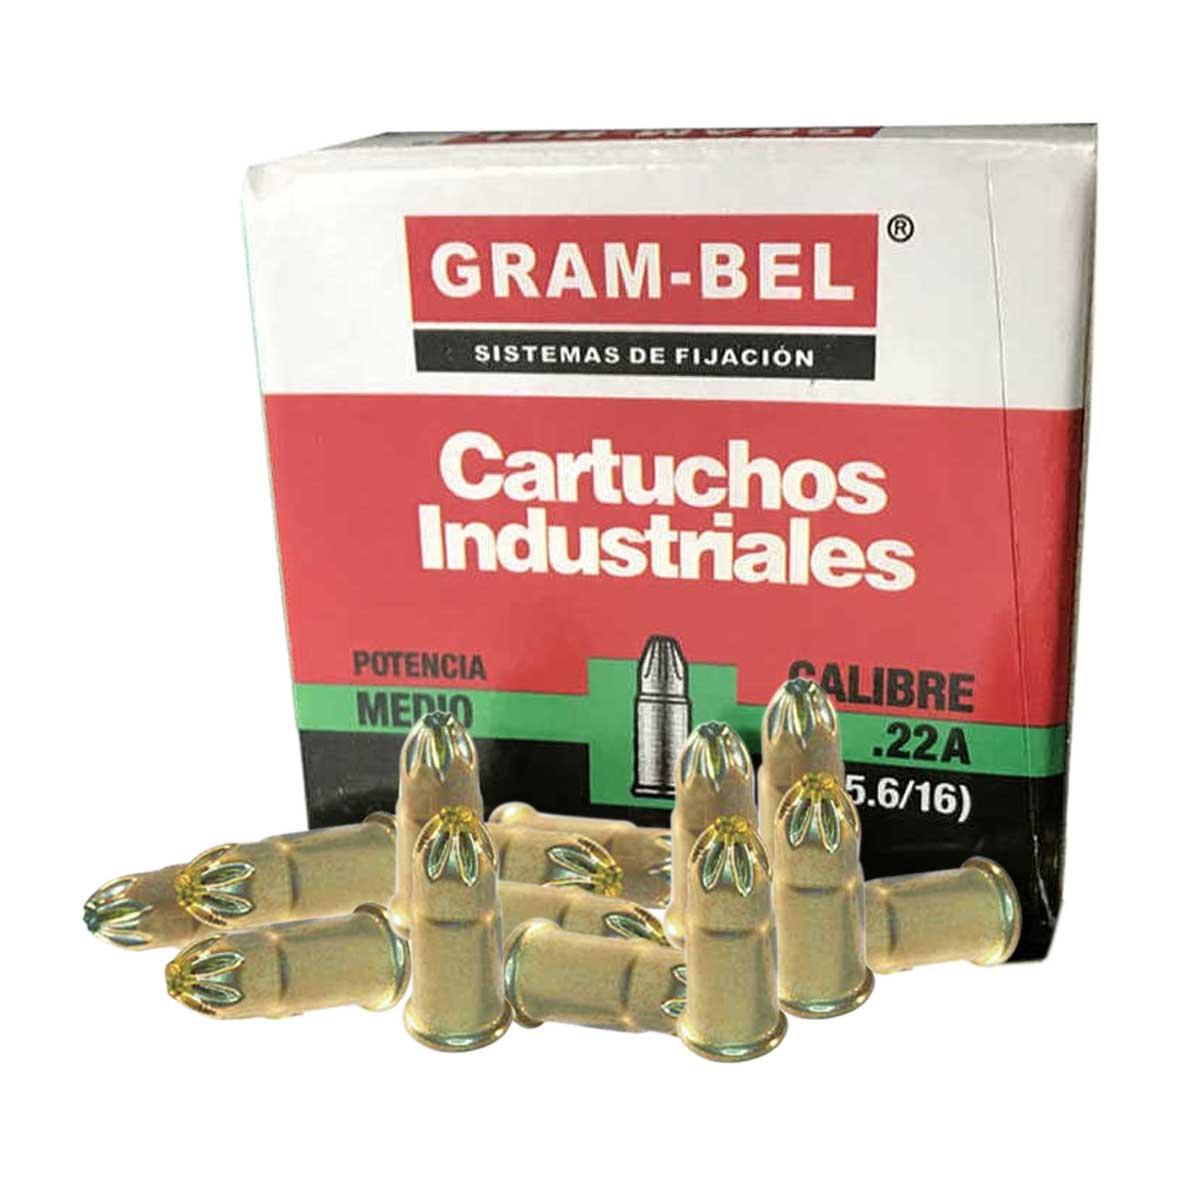 Cartucho Verde Cal 22 100 Pzs De Pistola Impacto Gram-Bel